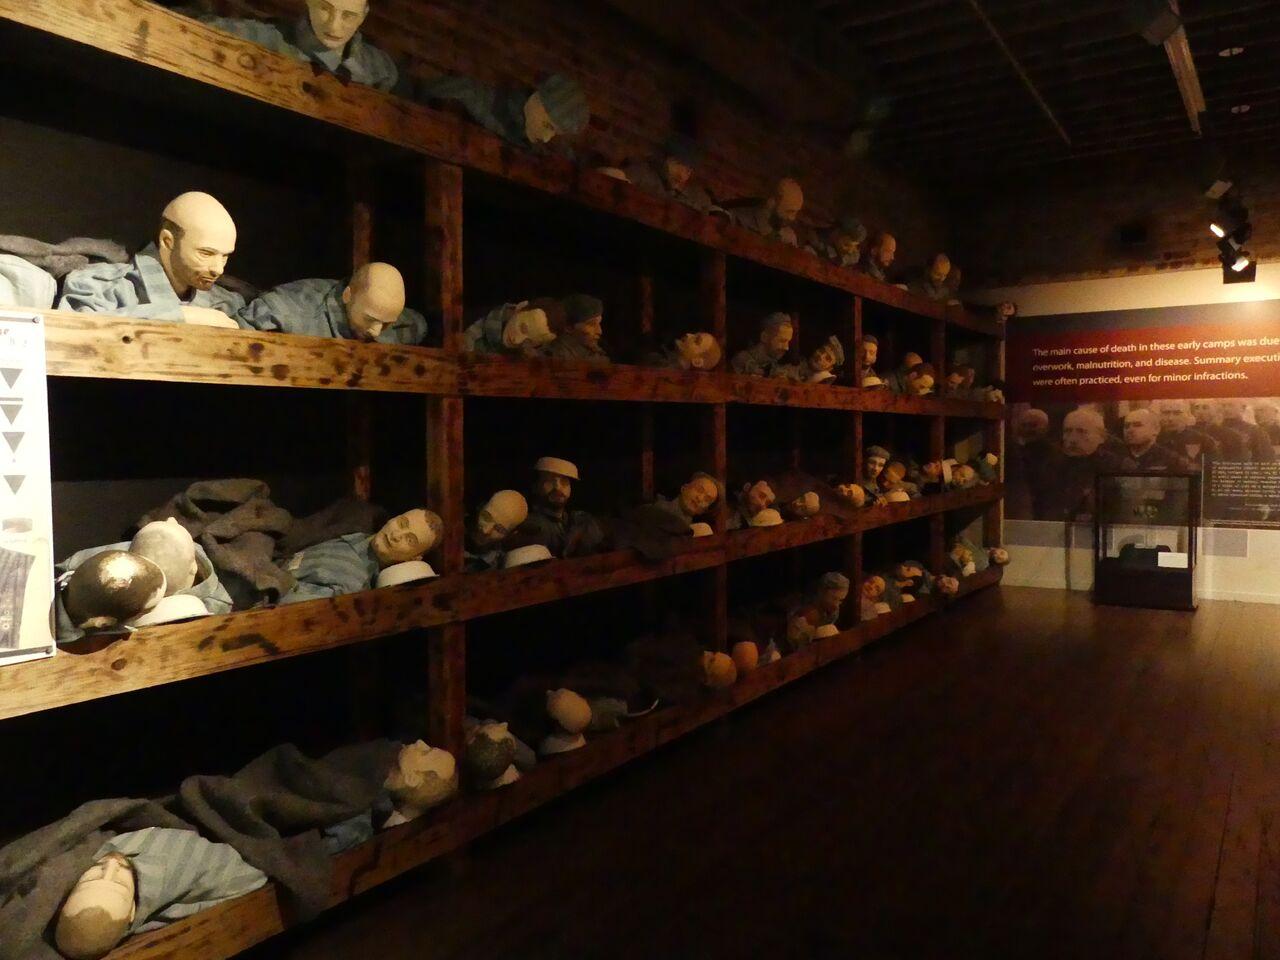 Exhibit of Holocaust prisoners in barracks. Photo: Kathleen Walls